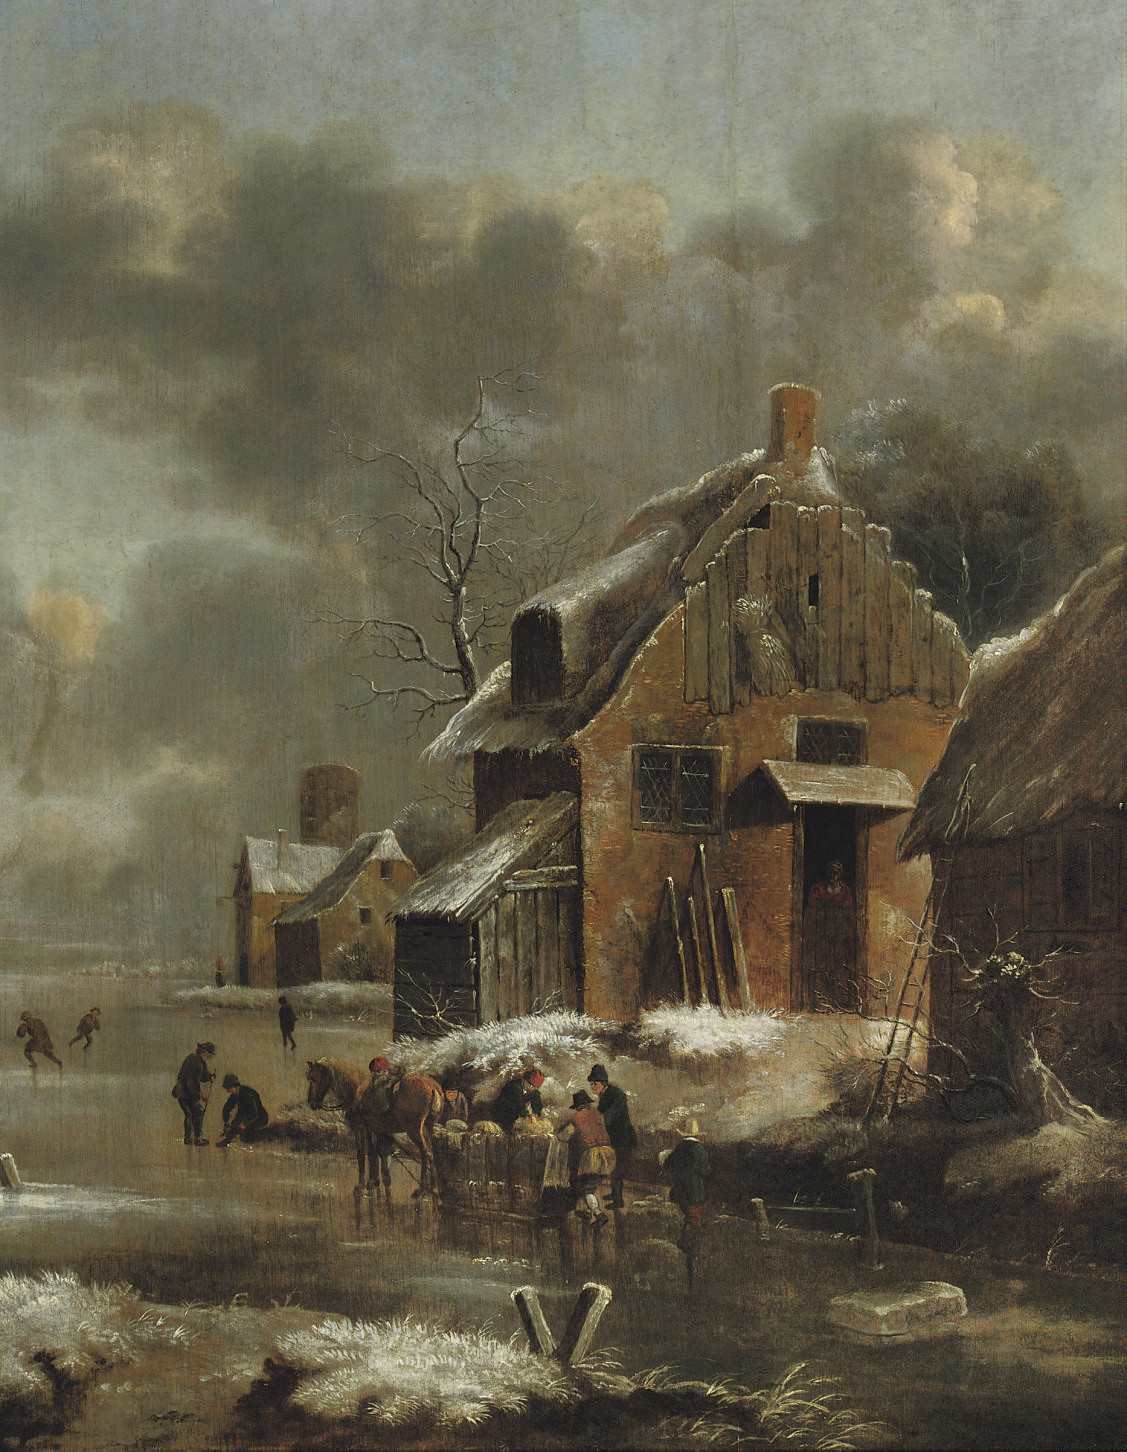 Klaes Molenaer (Haarlem 1610-1